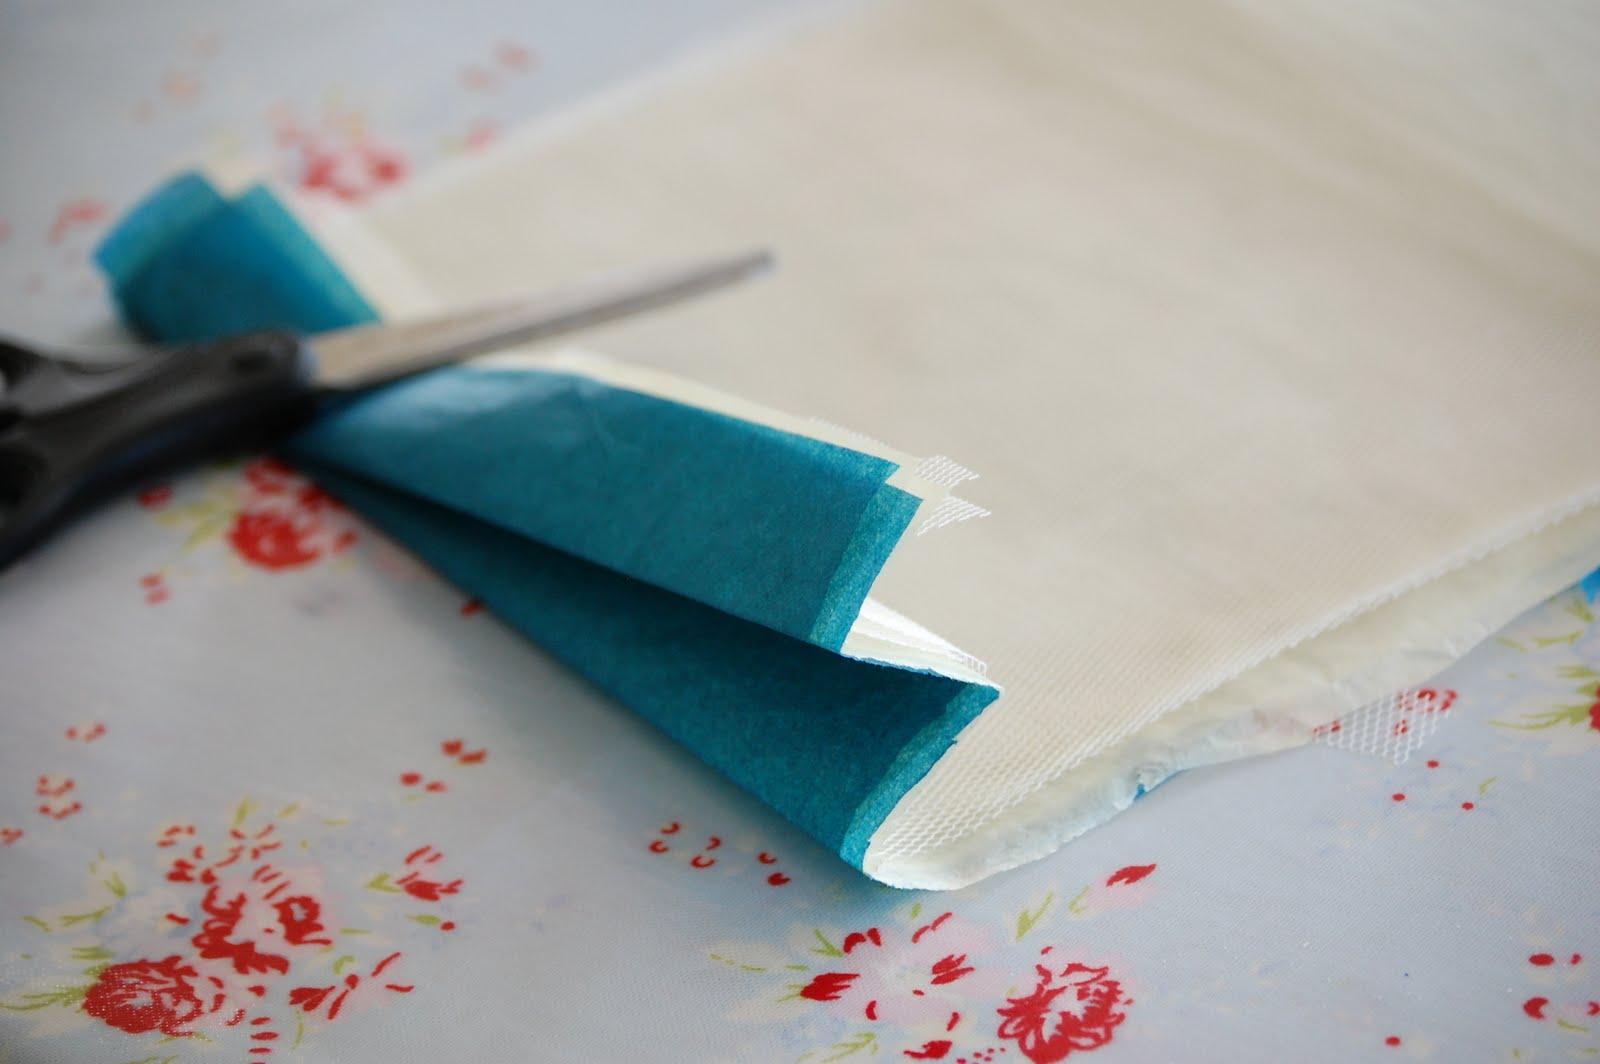 como fazer pompom papel de seda tule decoracao festa aniversario batizado casamento cha de bebe (2)